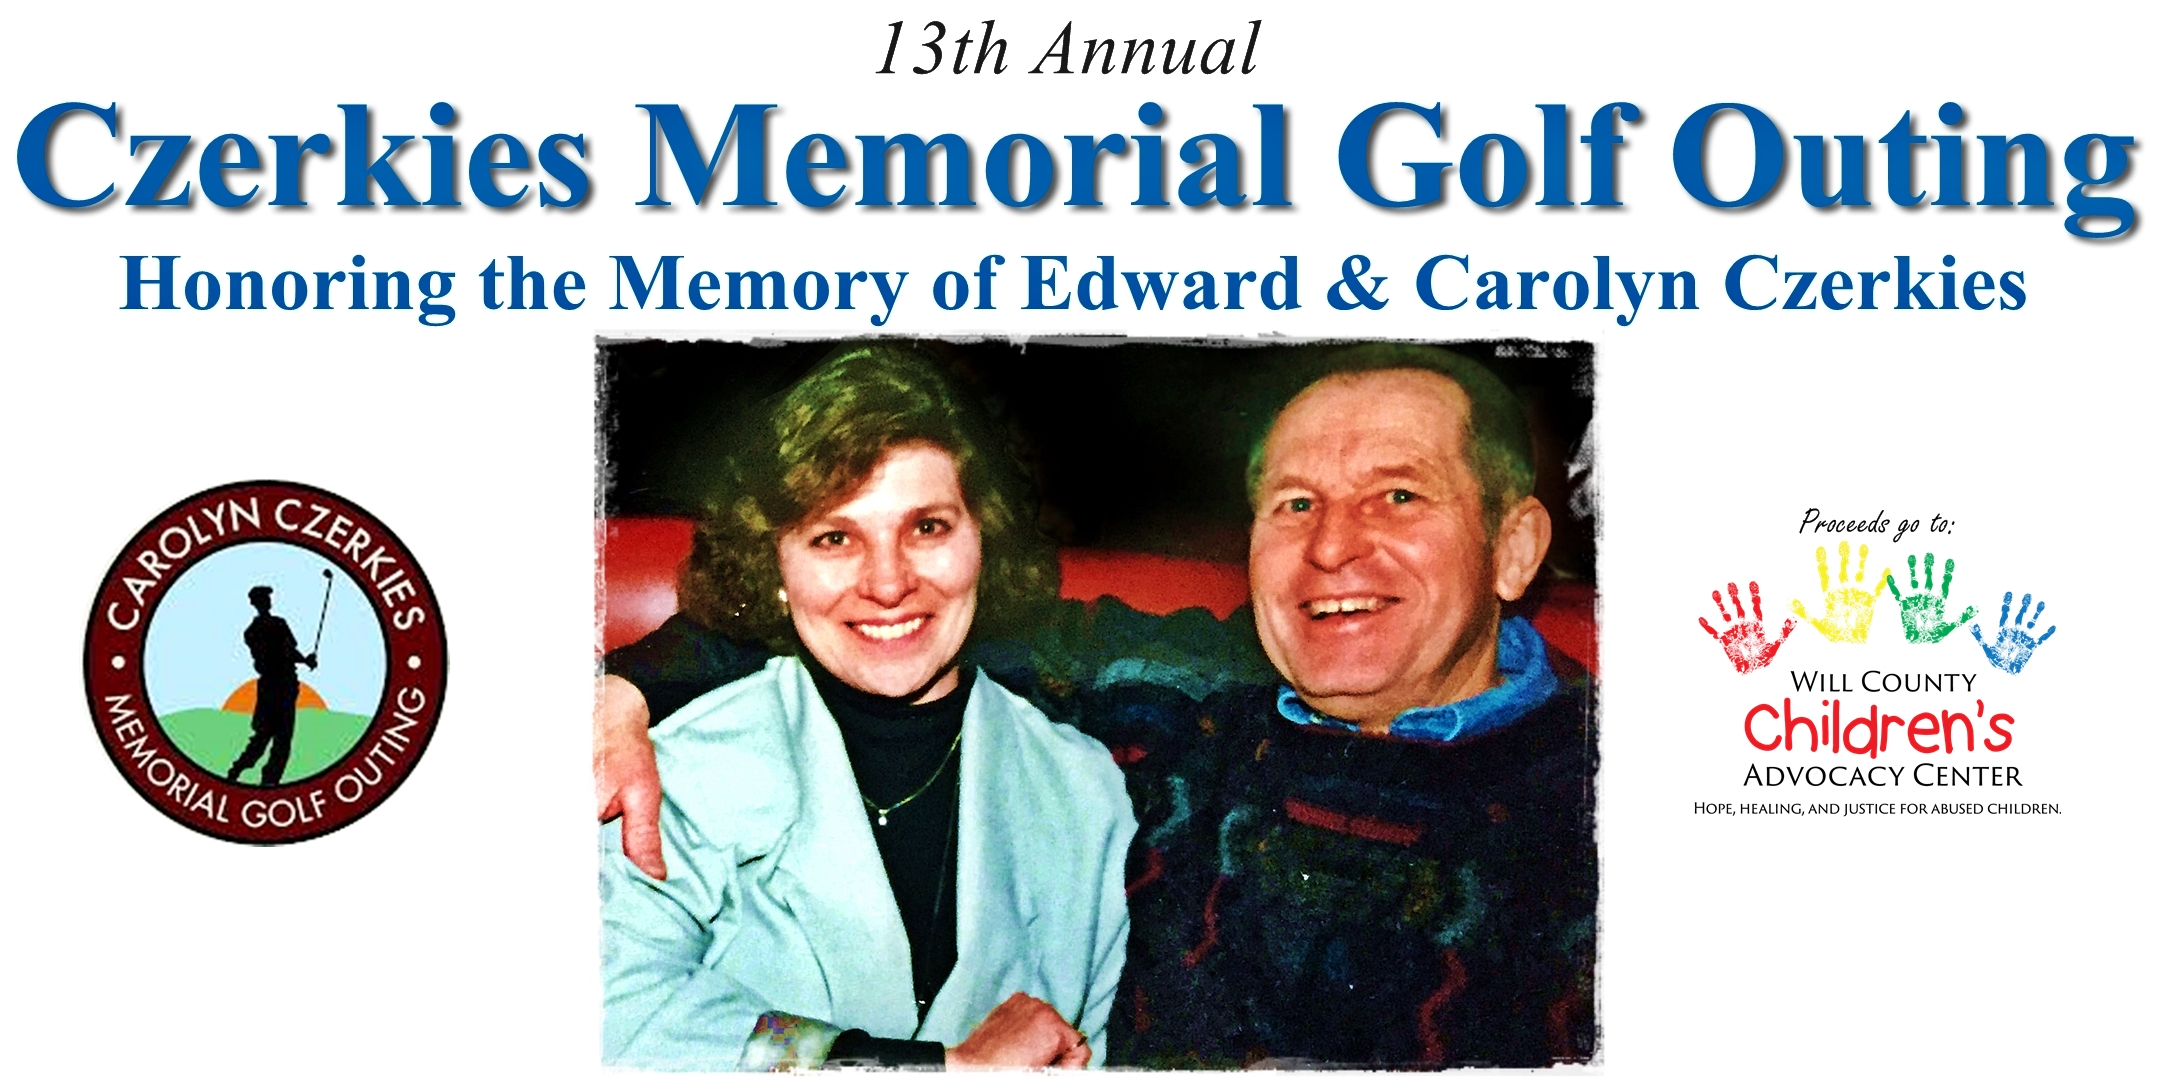 13th Annual Czerkies Memorial Golf Outing